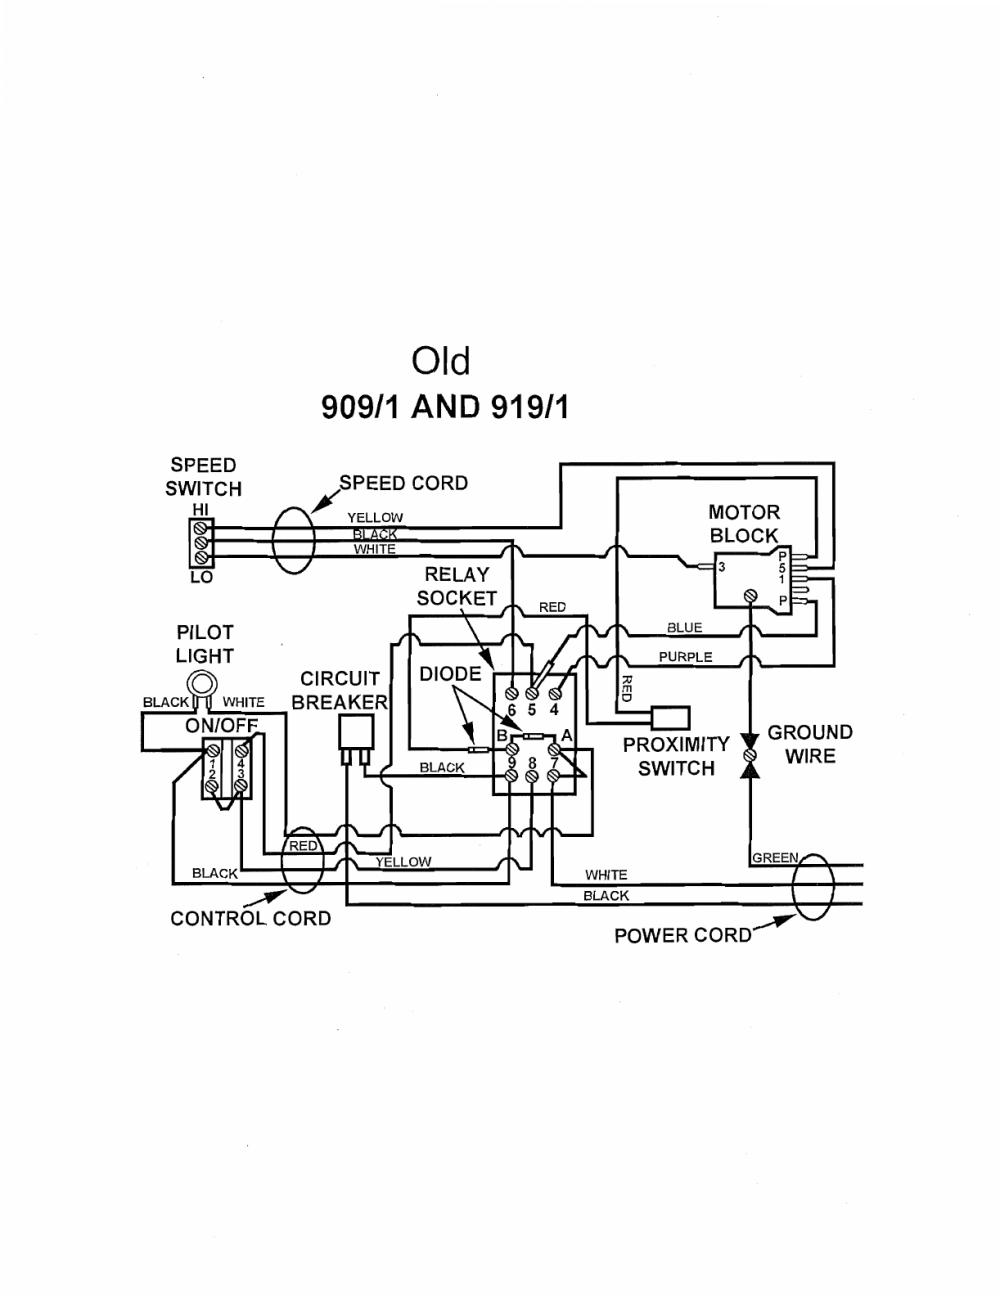 medium resolution of berkel wiring diagram wiring diagrams explo berkel slicer wiring diagram berkel 9091 user manual to the